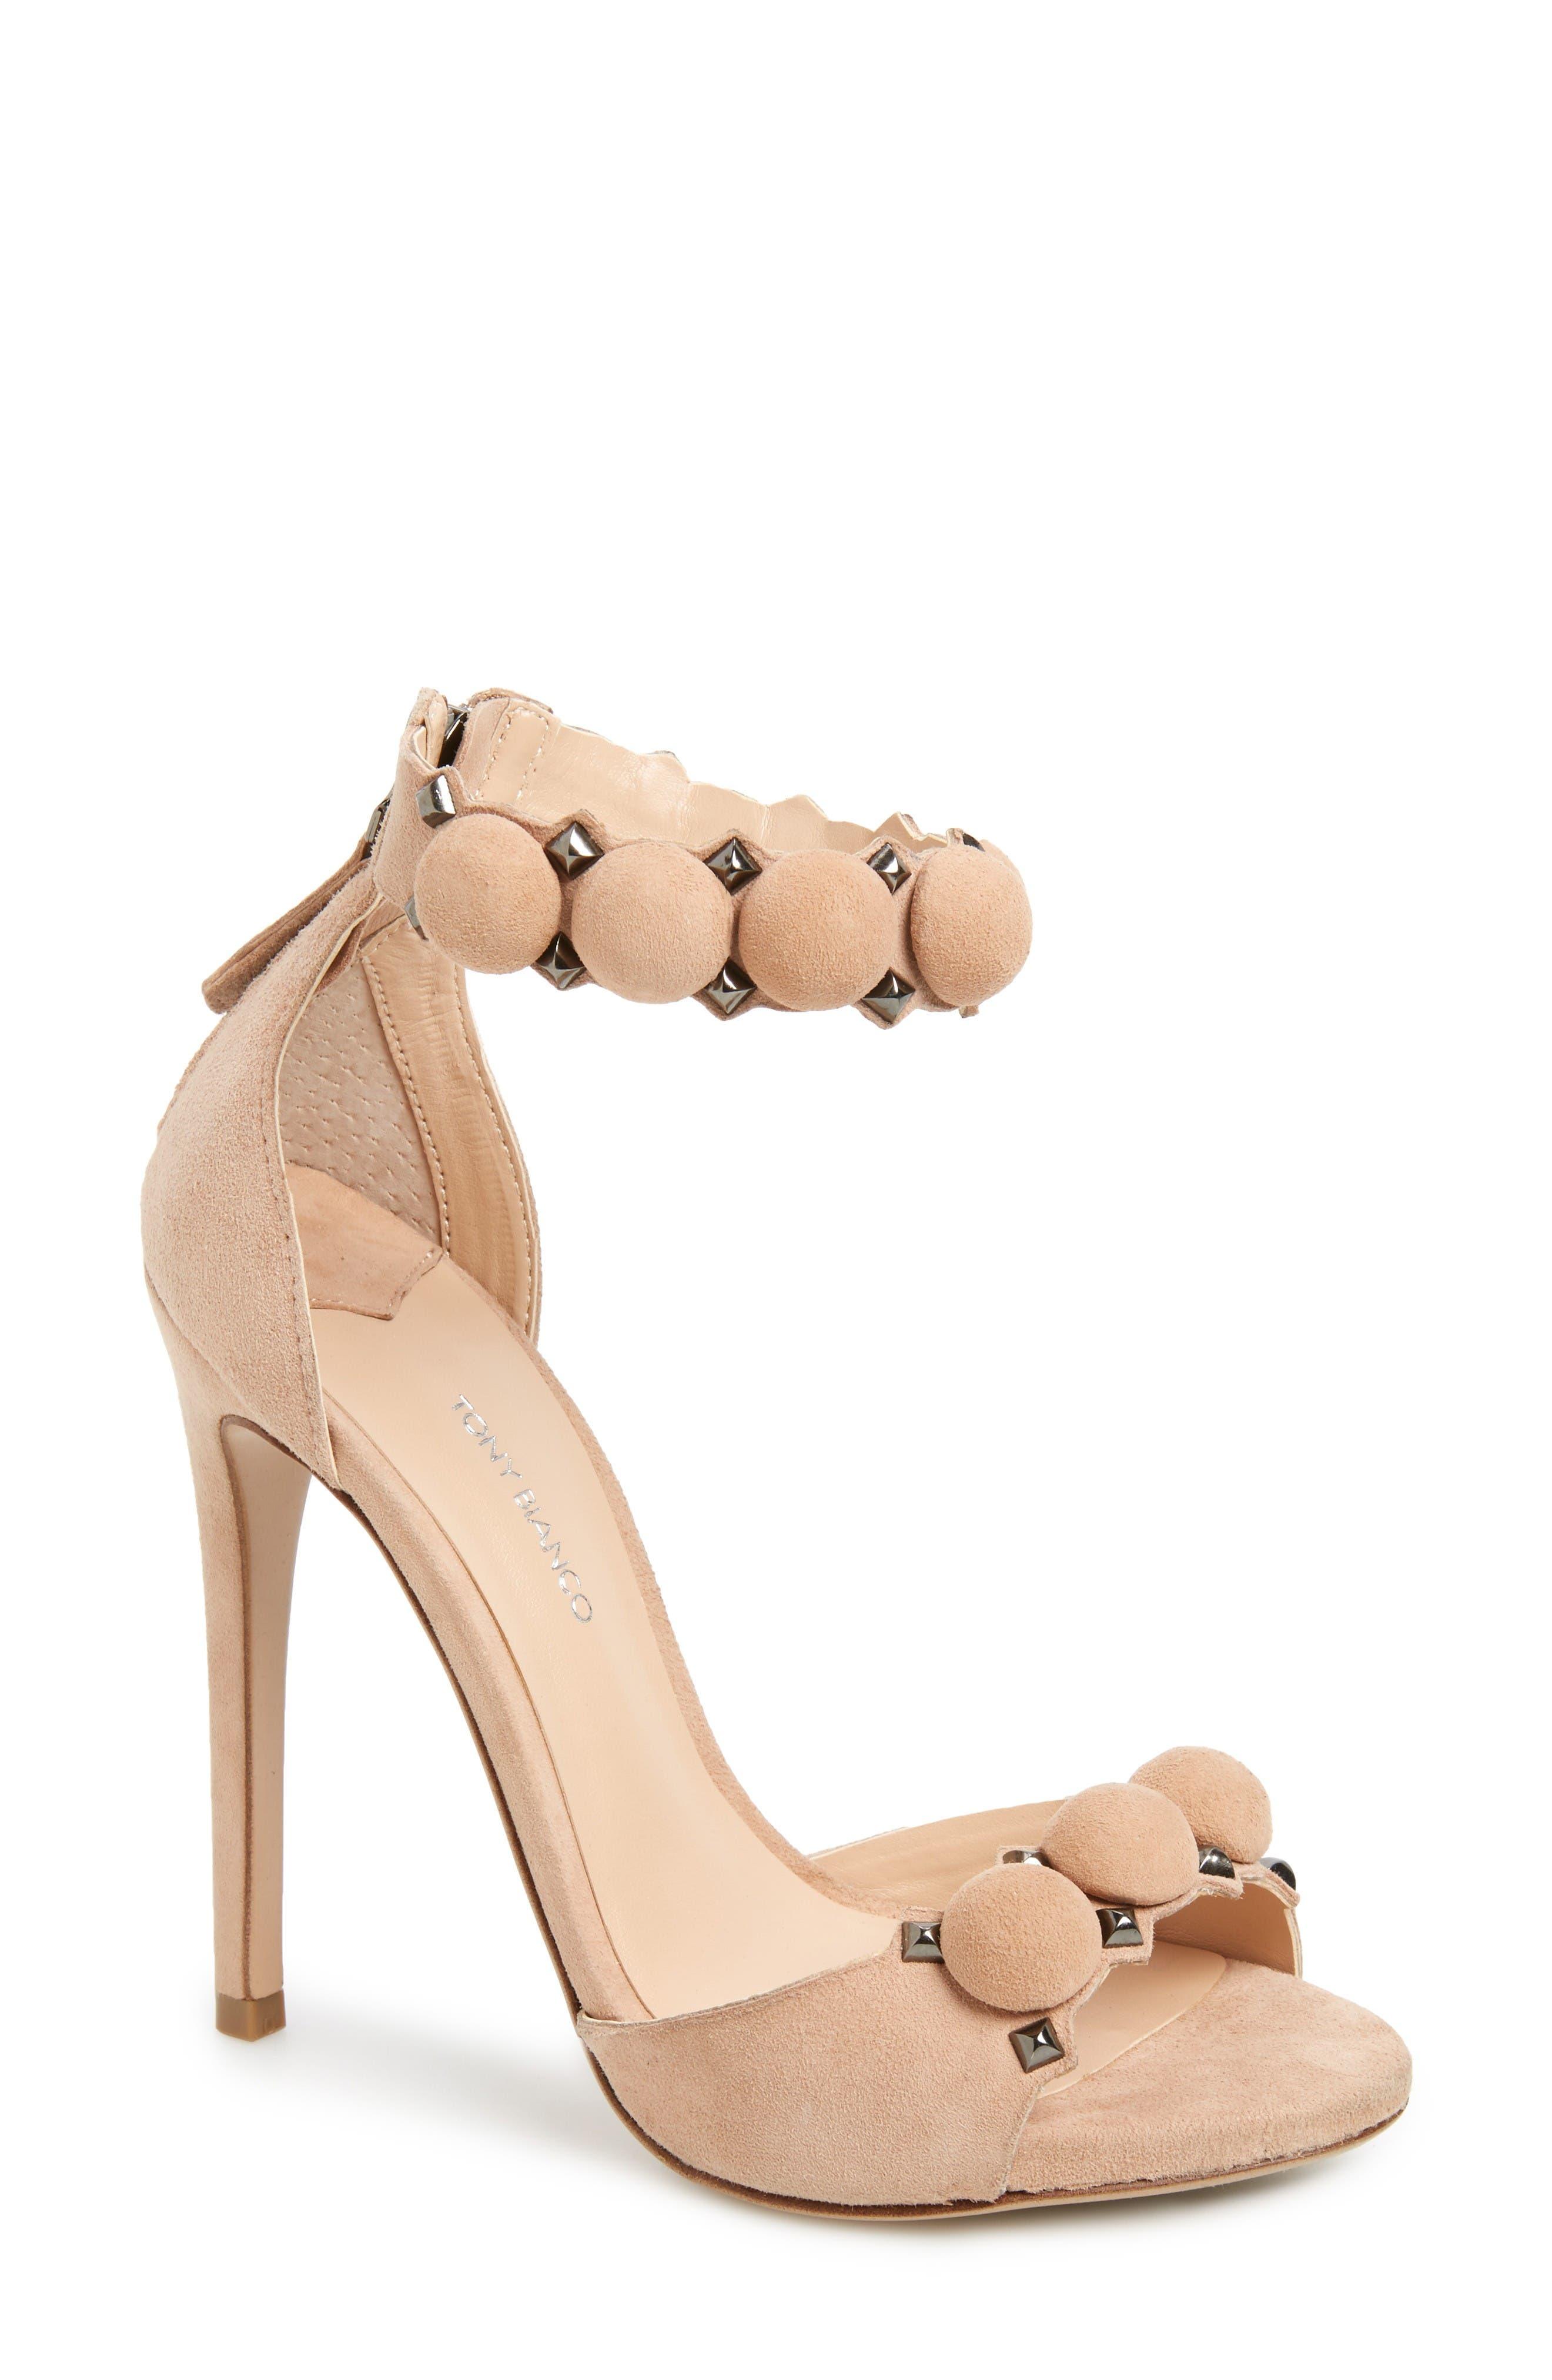 Alternate Image 1 Selected - Tony Bianco Ader Sandal (Women)